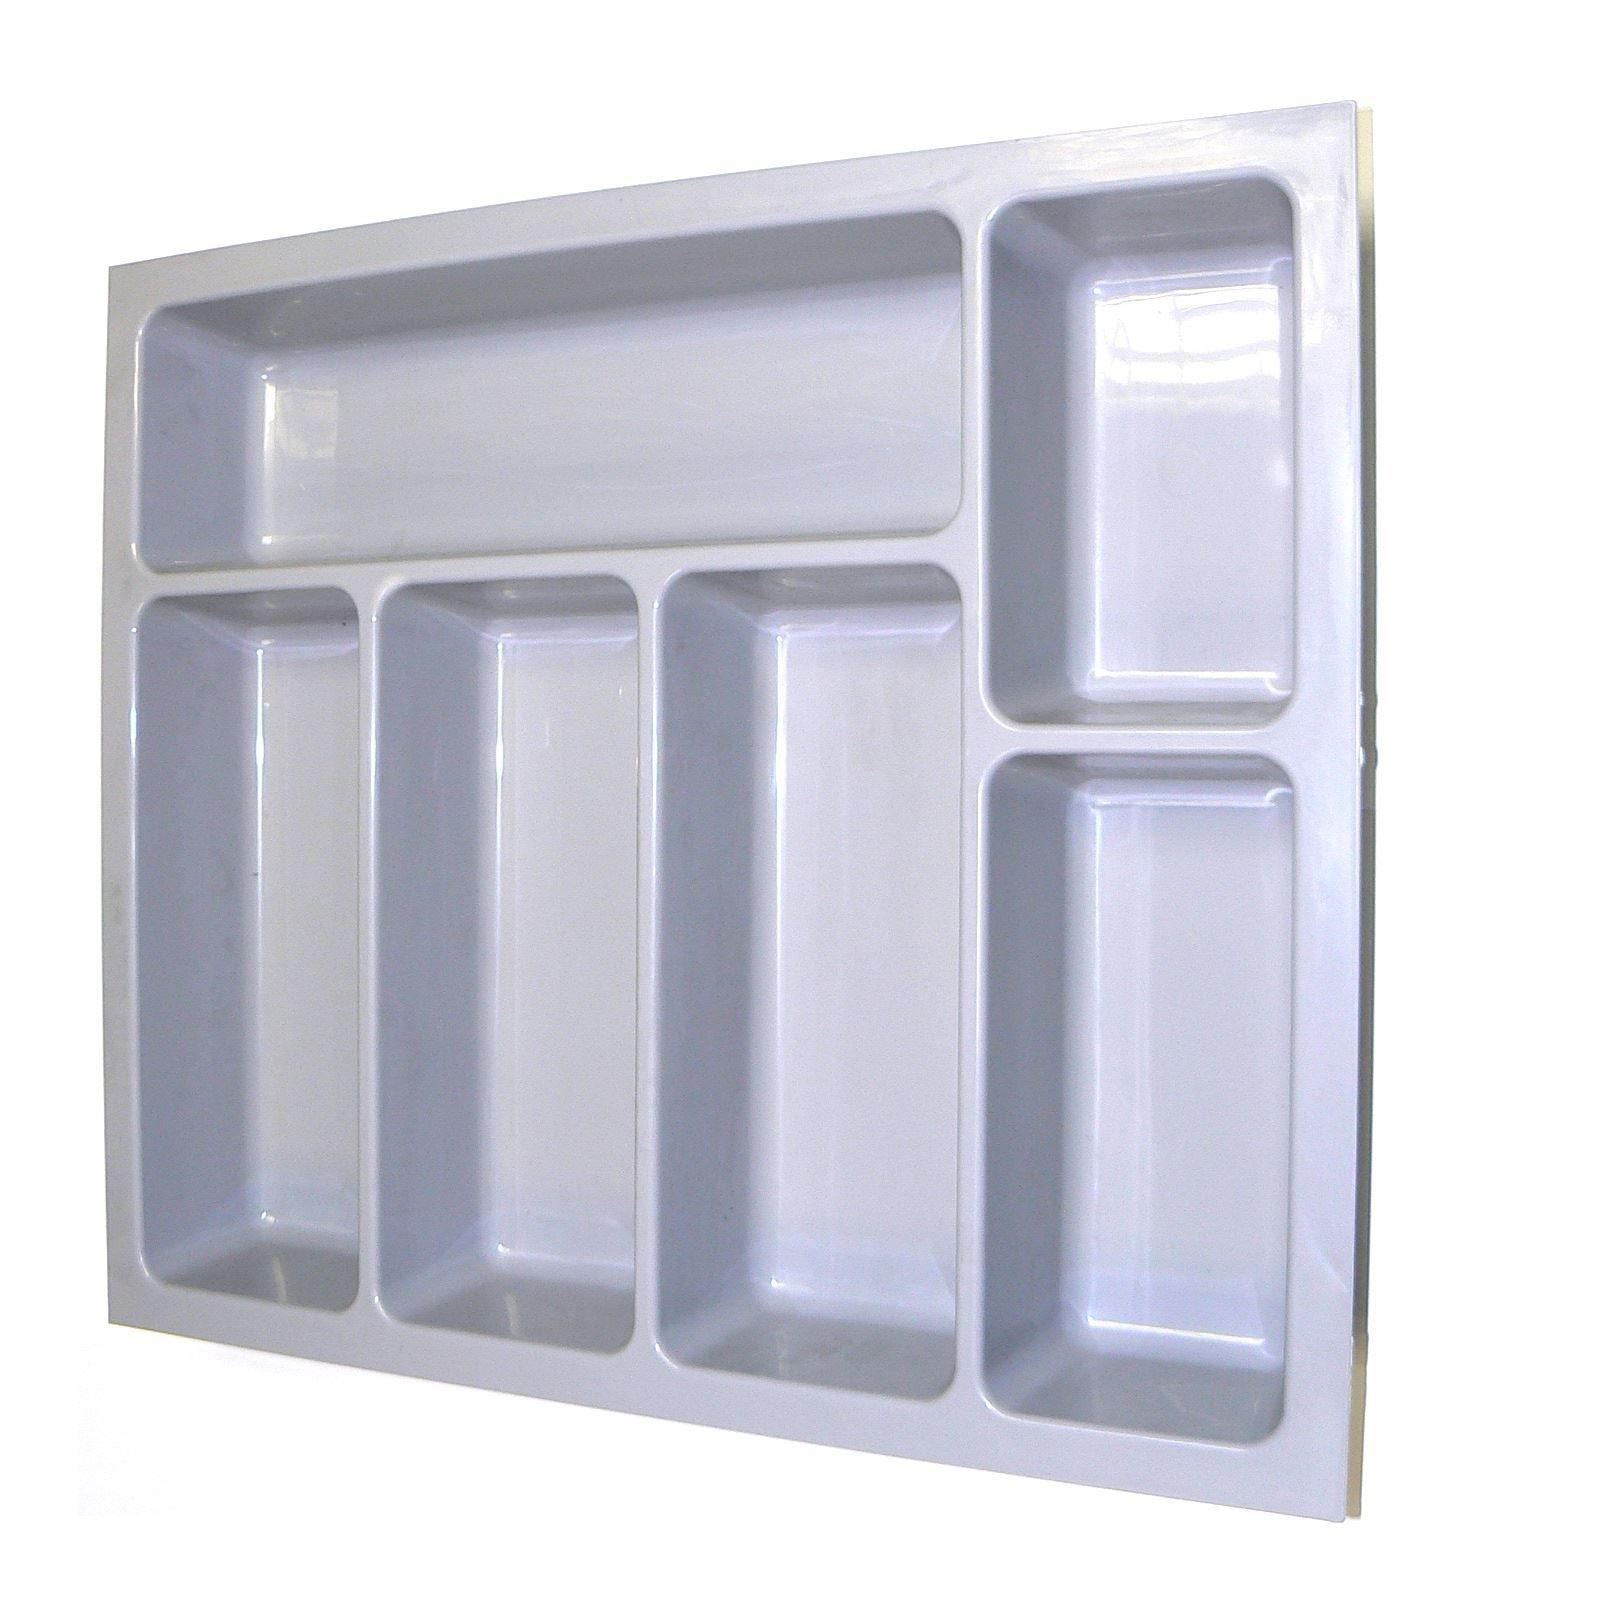 Quality Plastic Cutlery Trays Kitchen Drawers Blum Tandembox